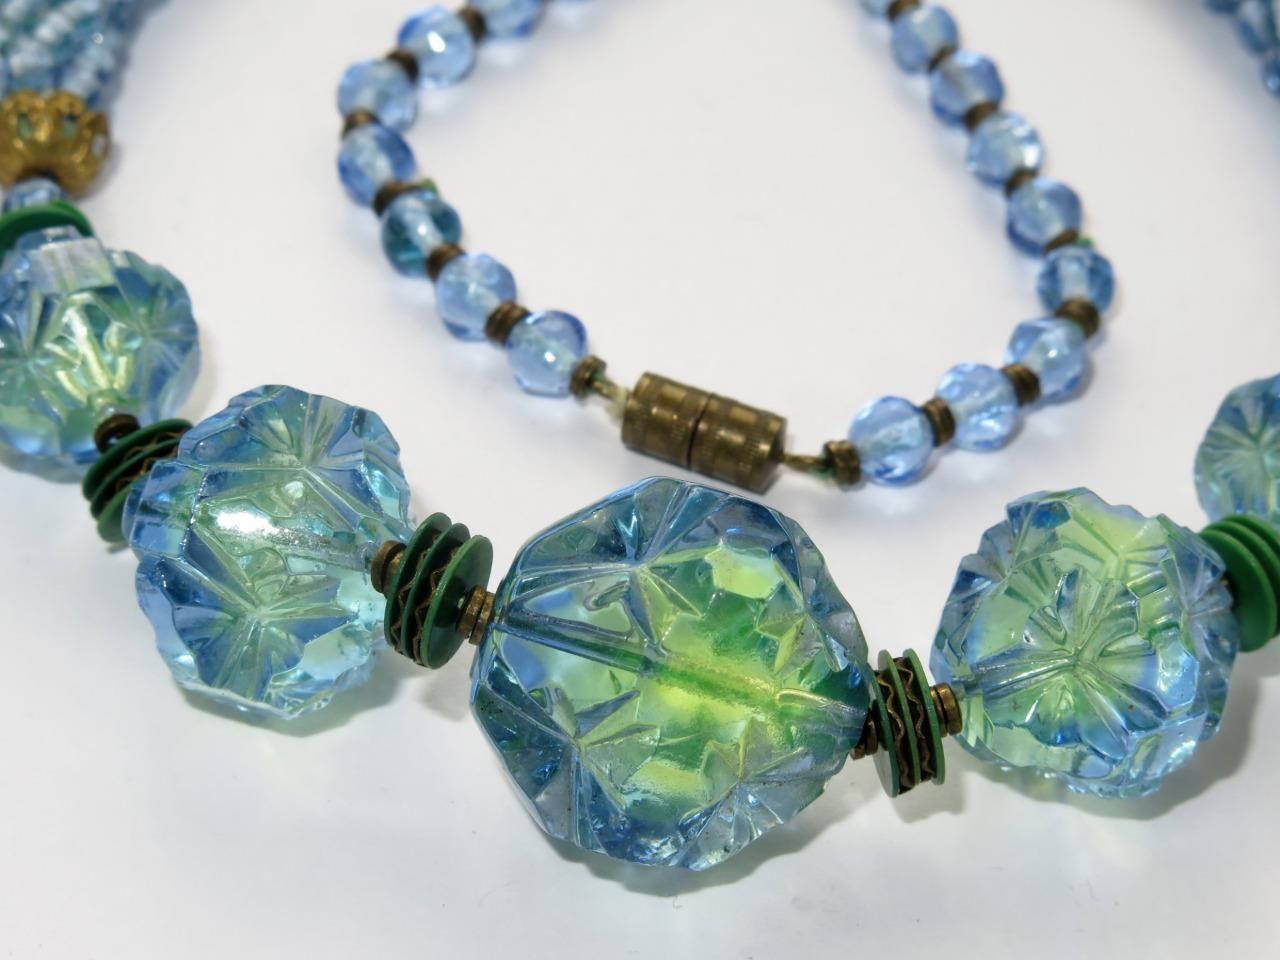 Beautiful Vintage Czech Neiger Uranium Glass Bead Necklace Art Deco Ebay Glass Bead Necklace Beaded Necklace Vintage Costume Jewelry